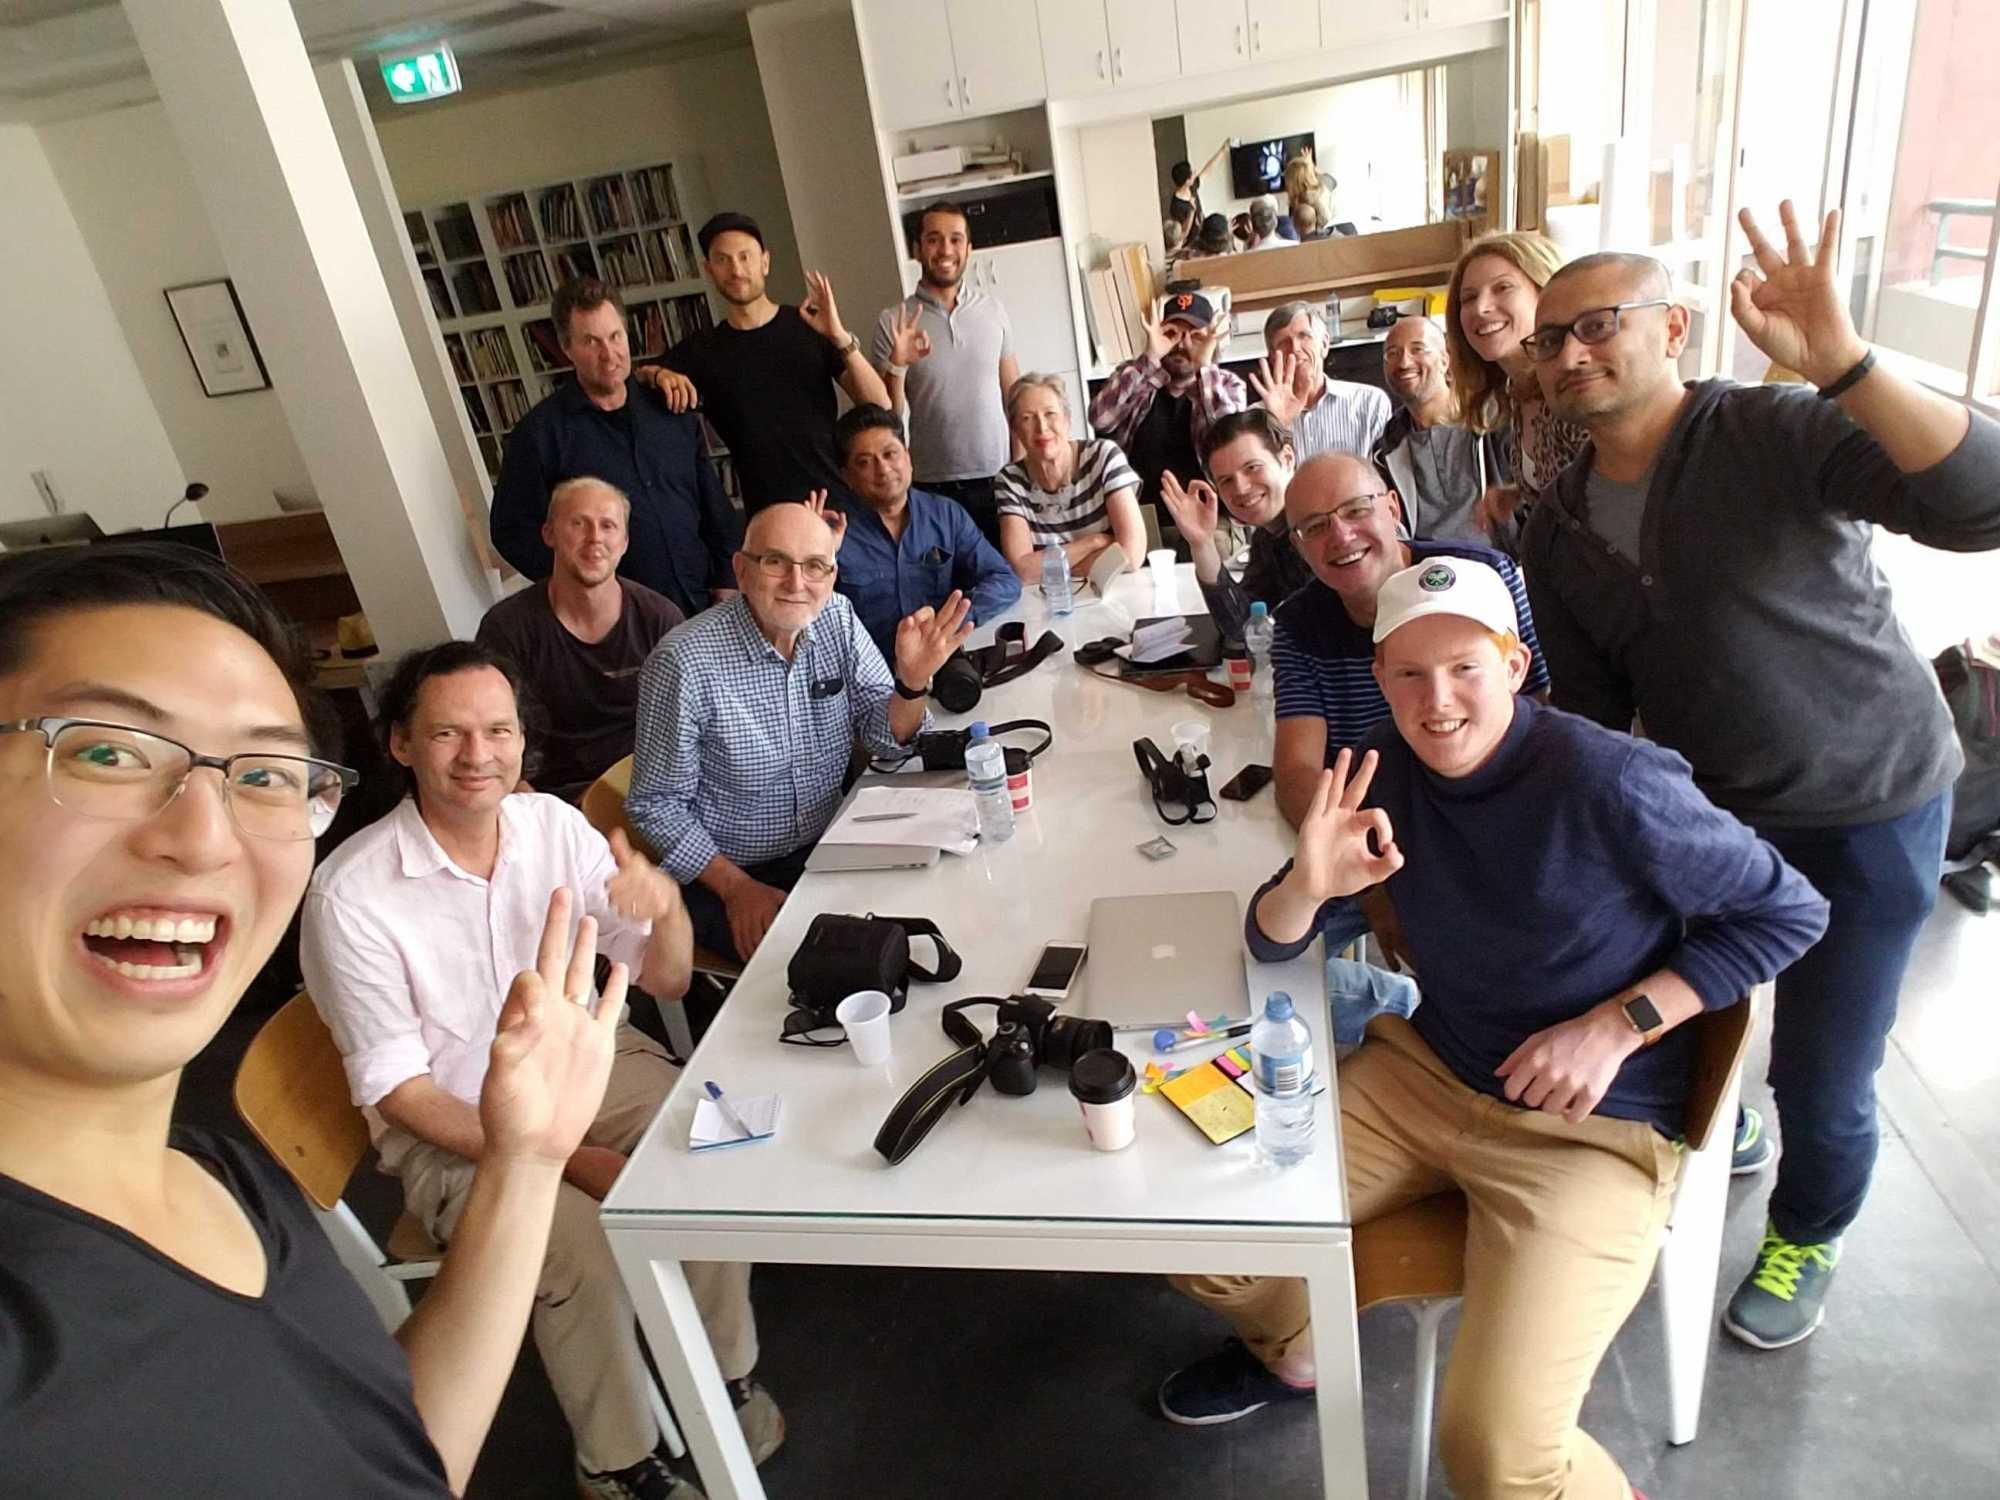 Sydney group selfie!